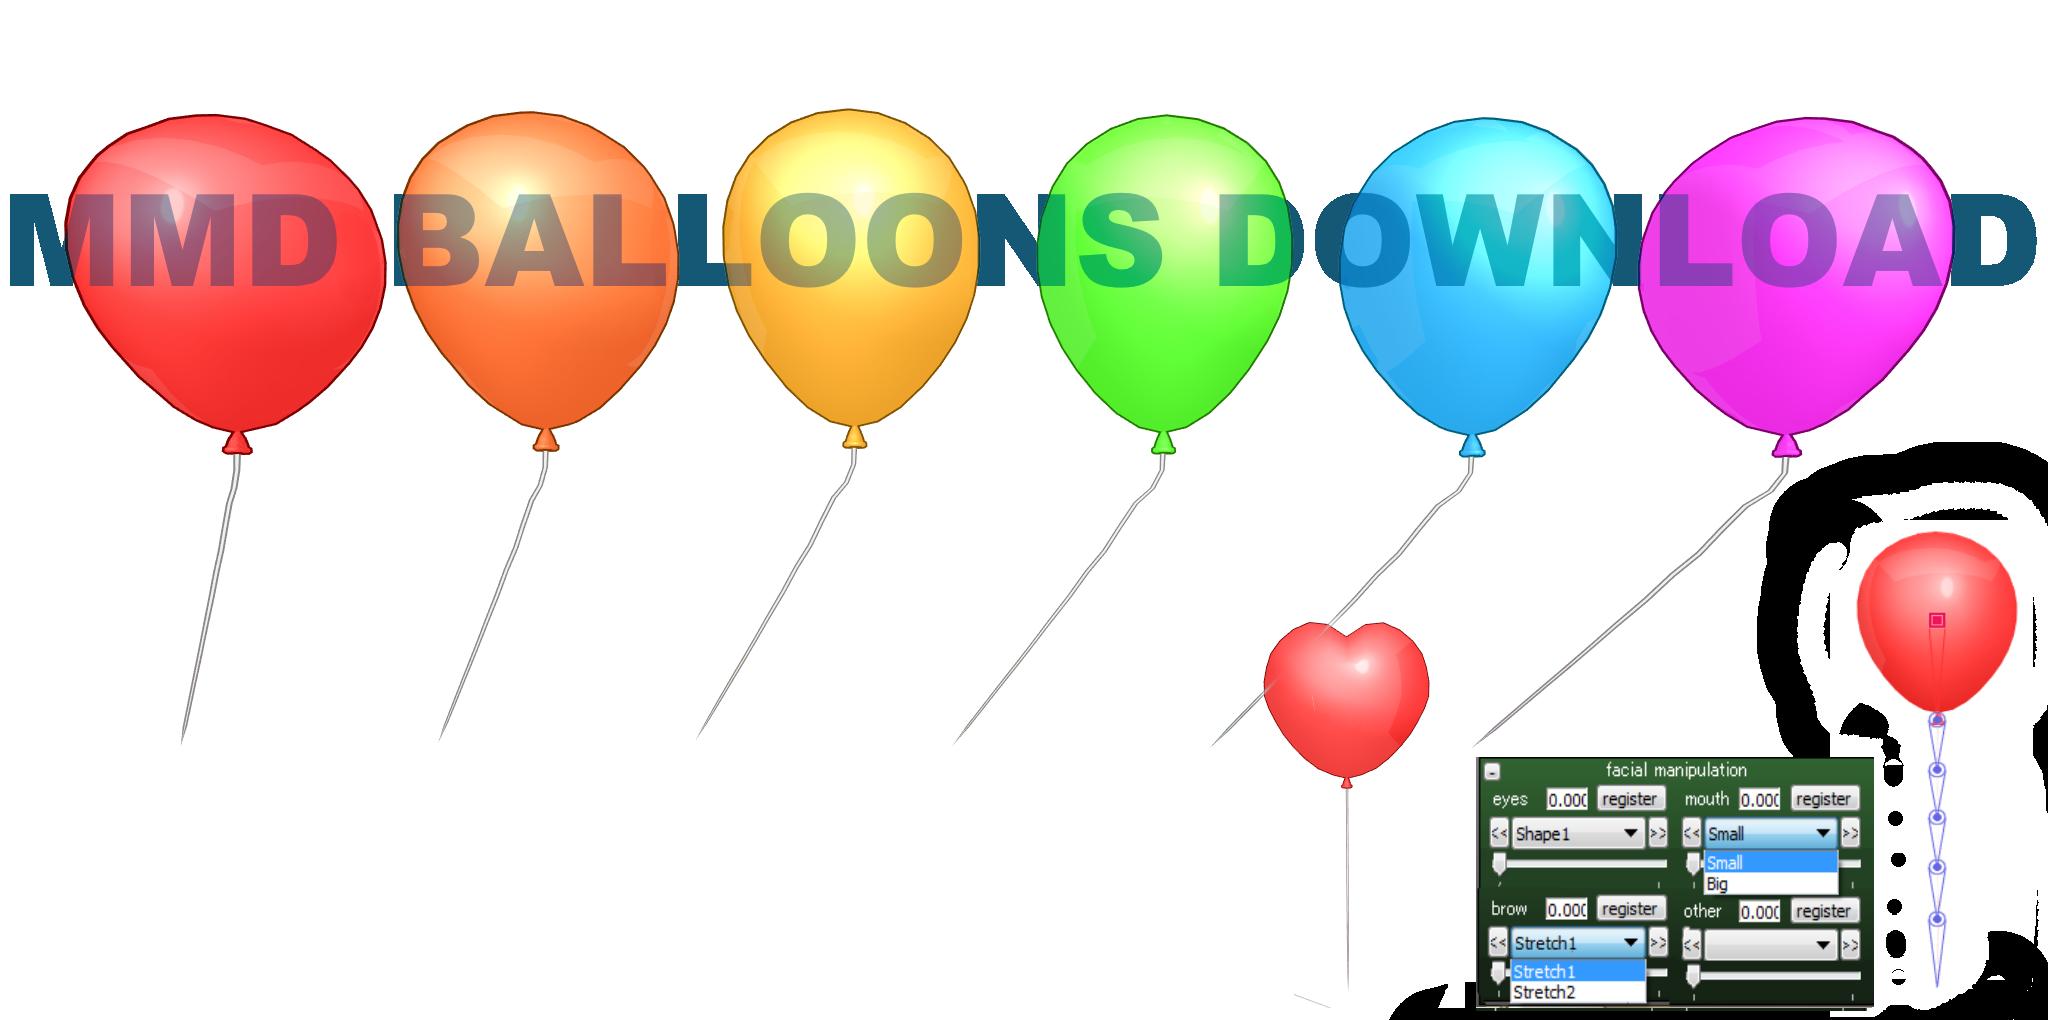 Baloons MMD DOWNLOAD (MMD ORIGINAL)